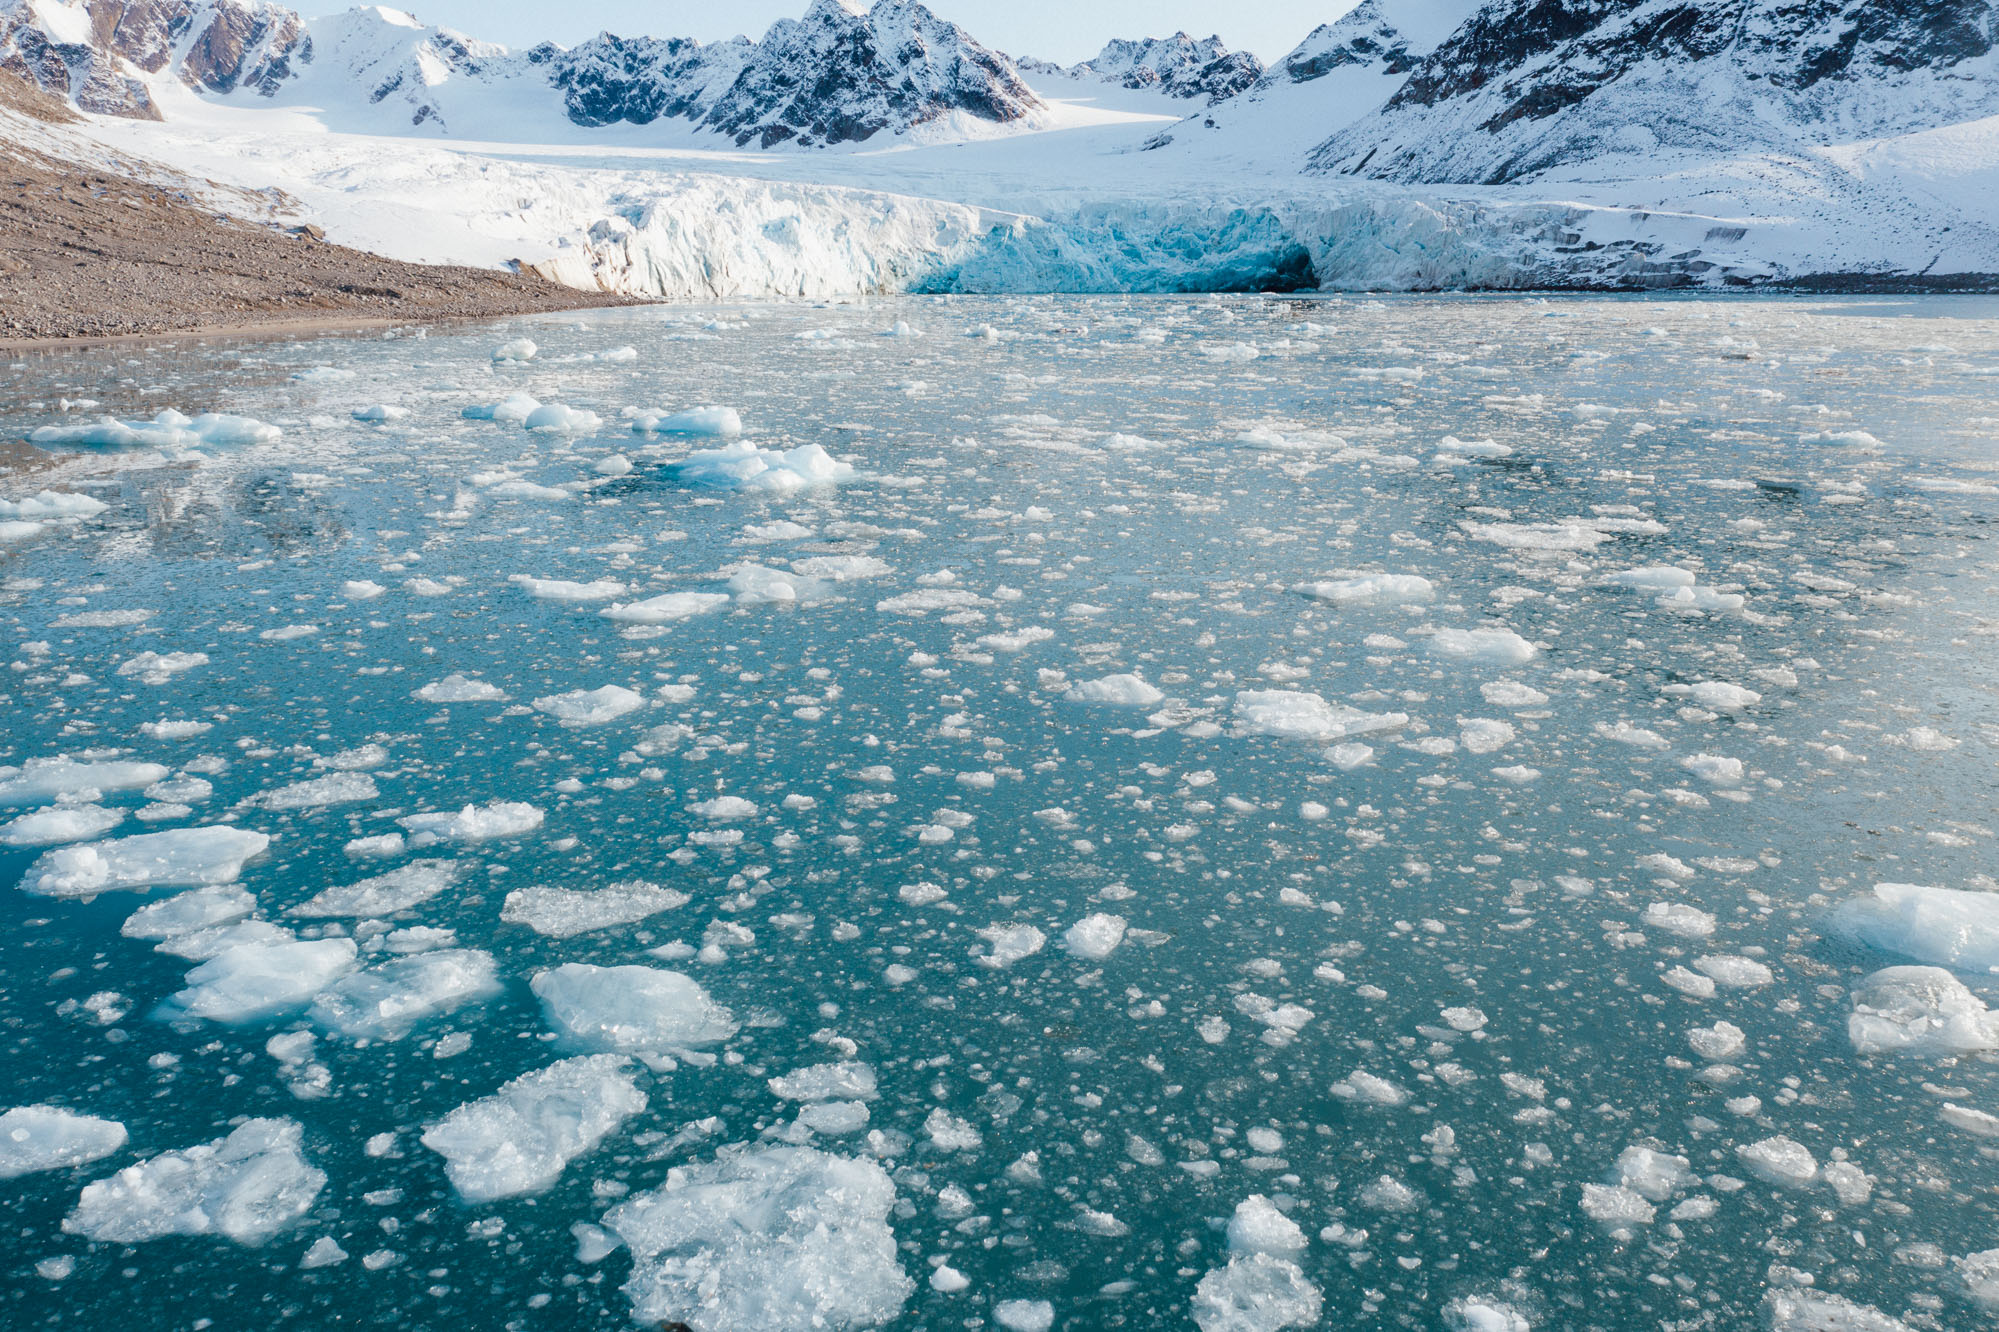 Magdalenefjorden drone aerial photo in Spitsbergen Svalbard via Find Us Lost